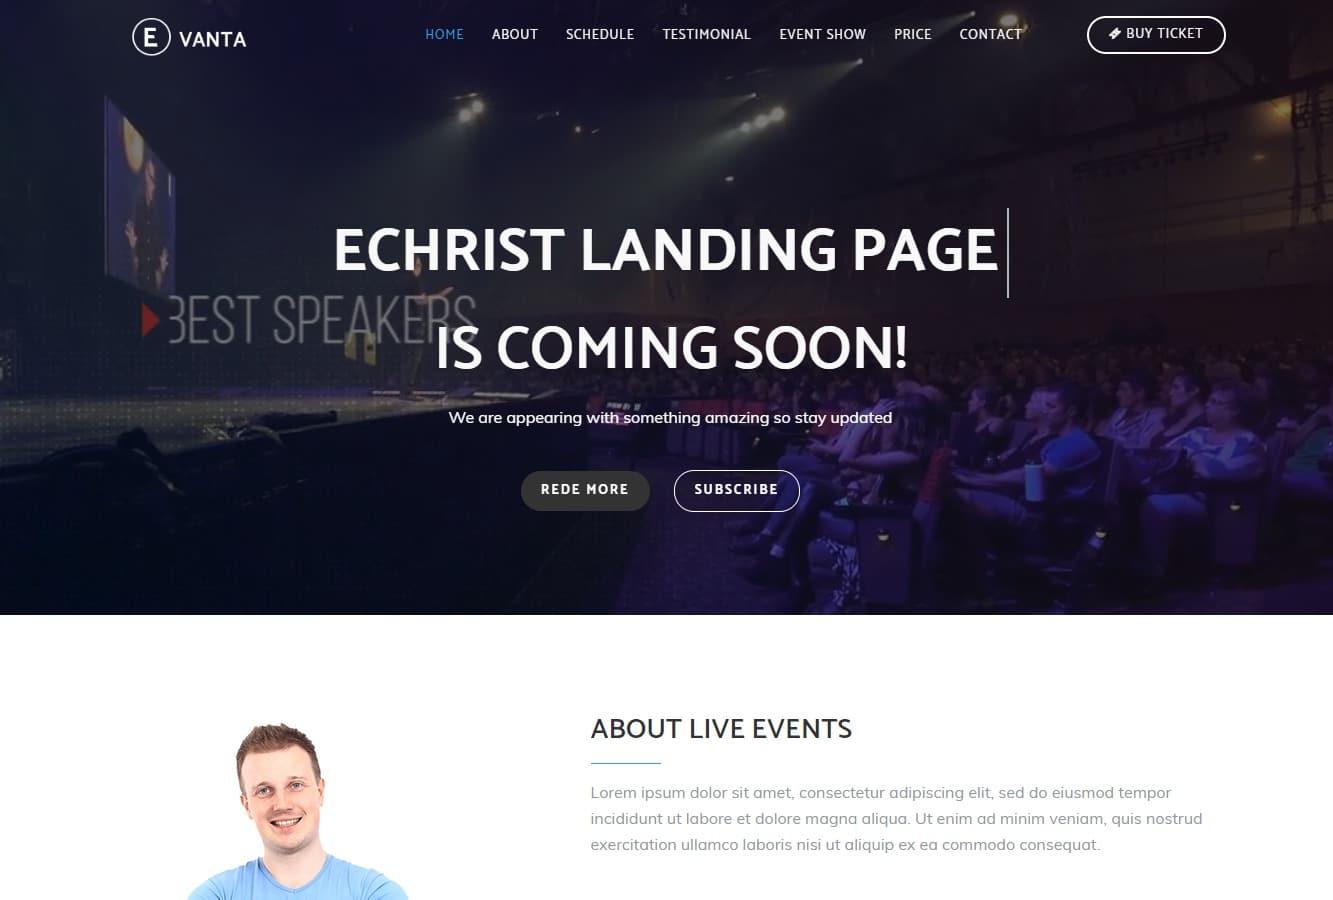 evanta-event-templates